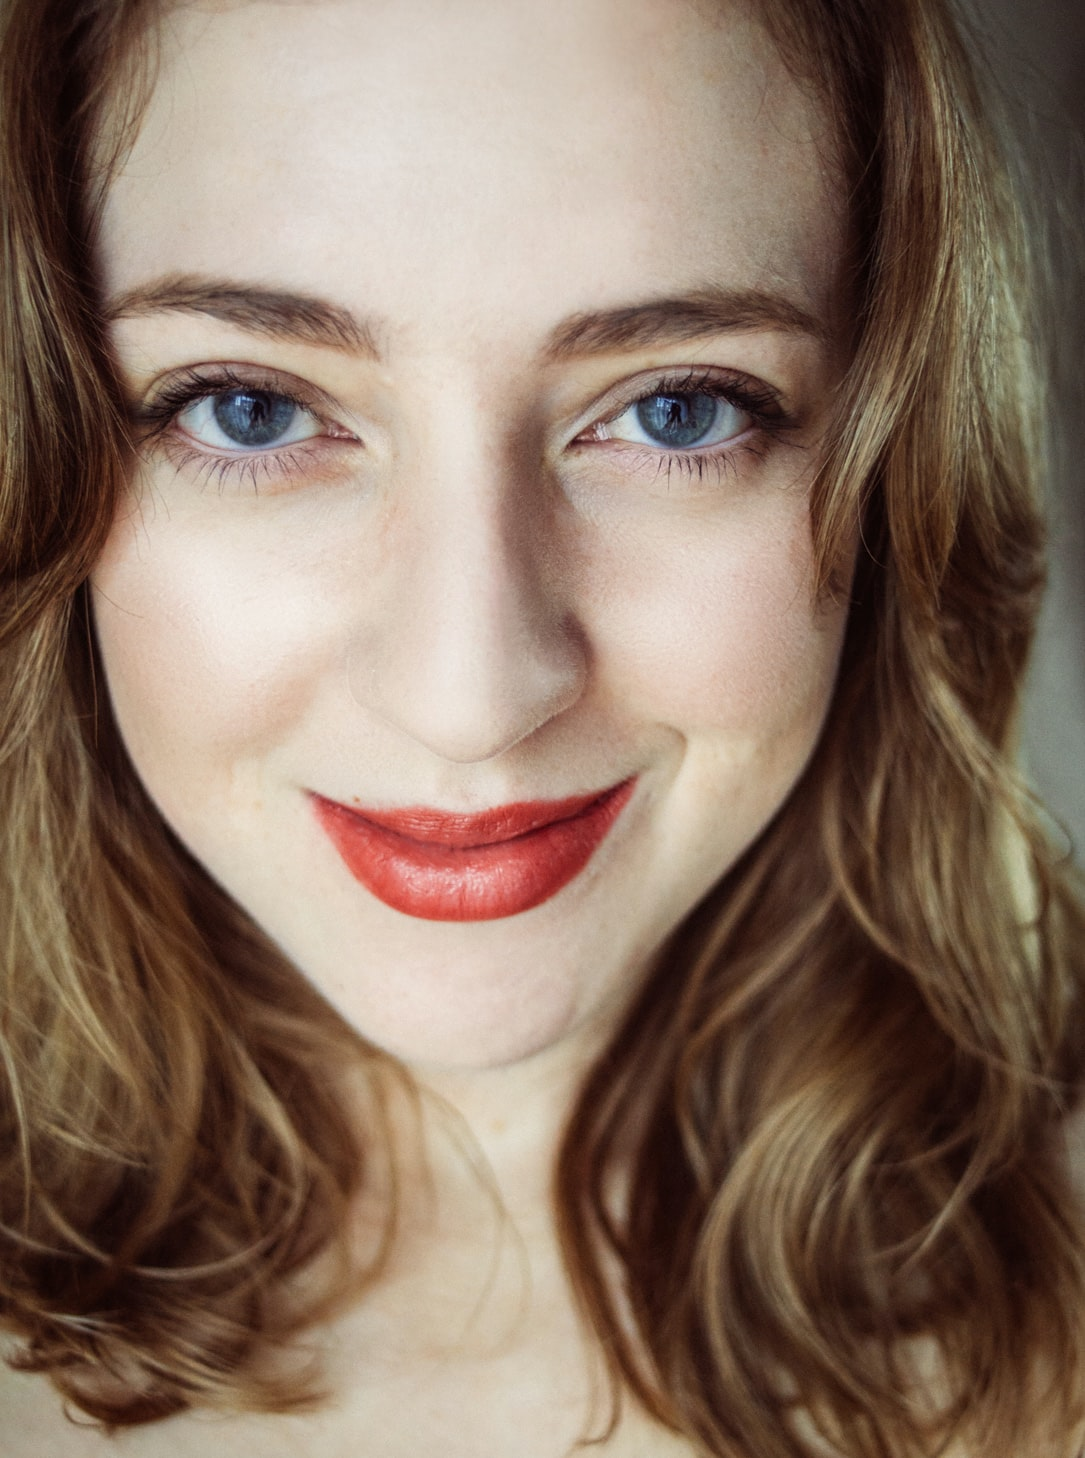 Go to Patrycja Polechonska's profile